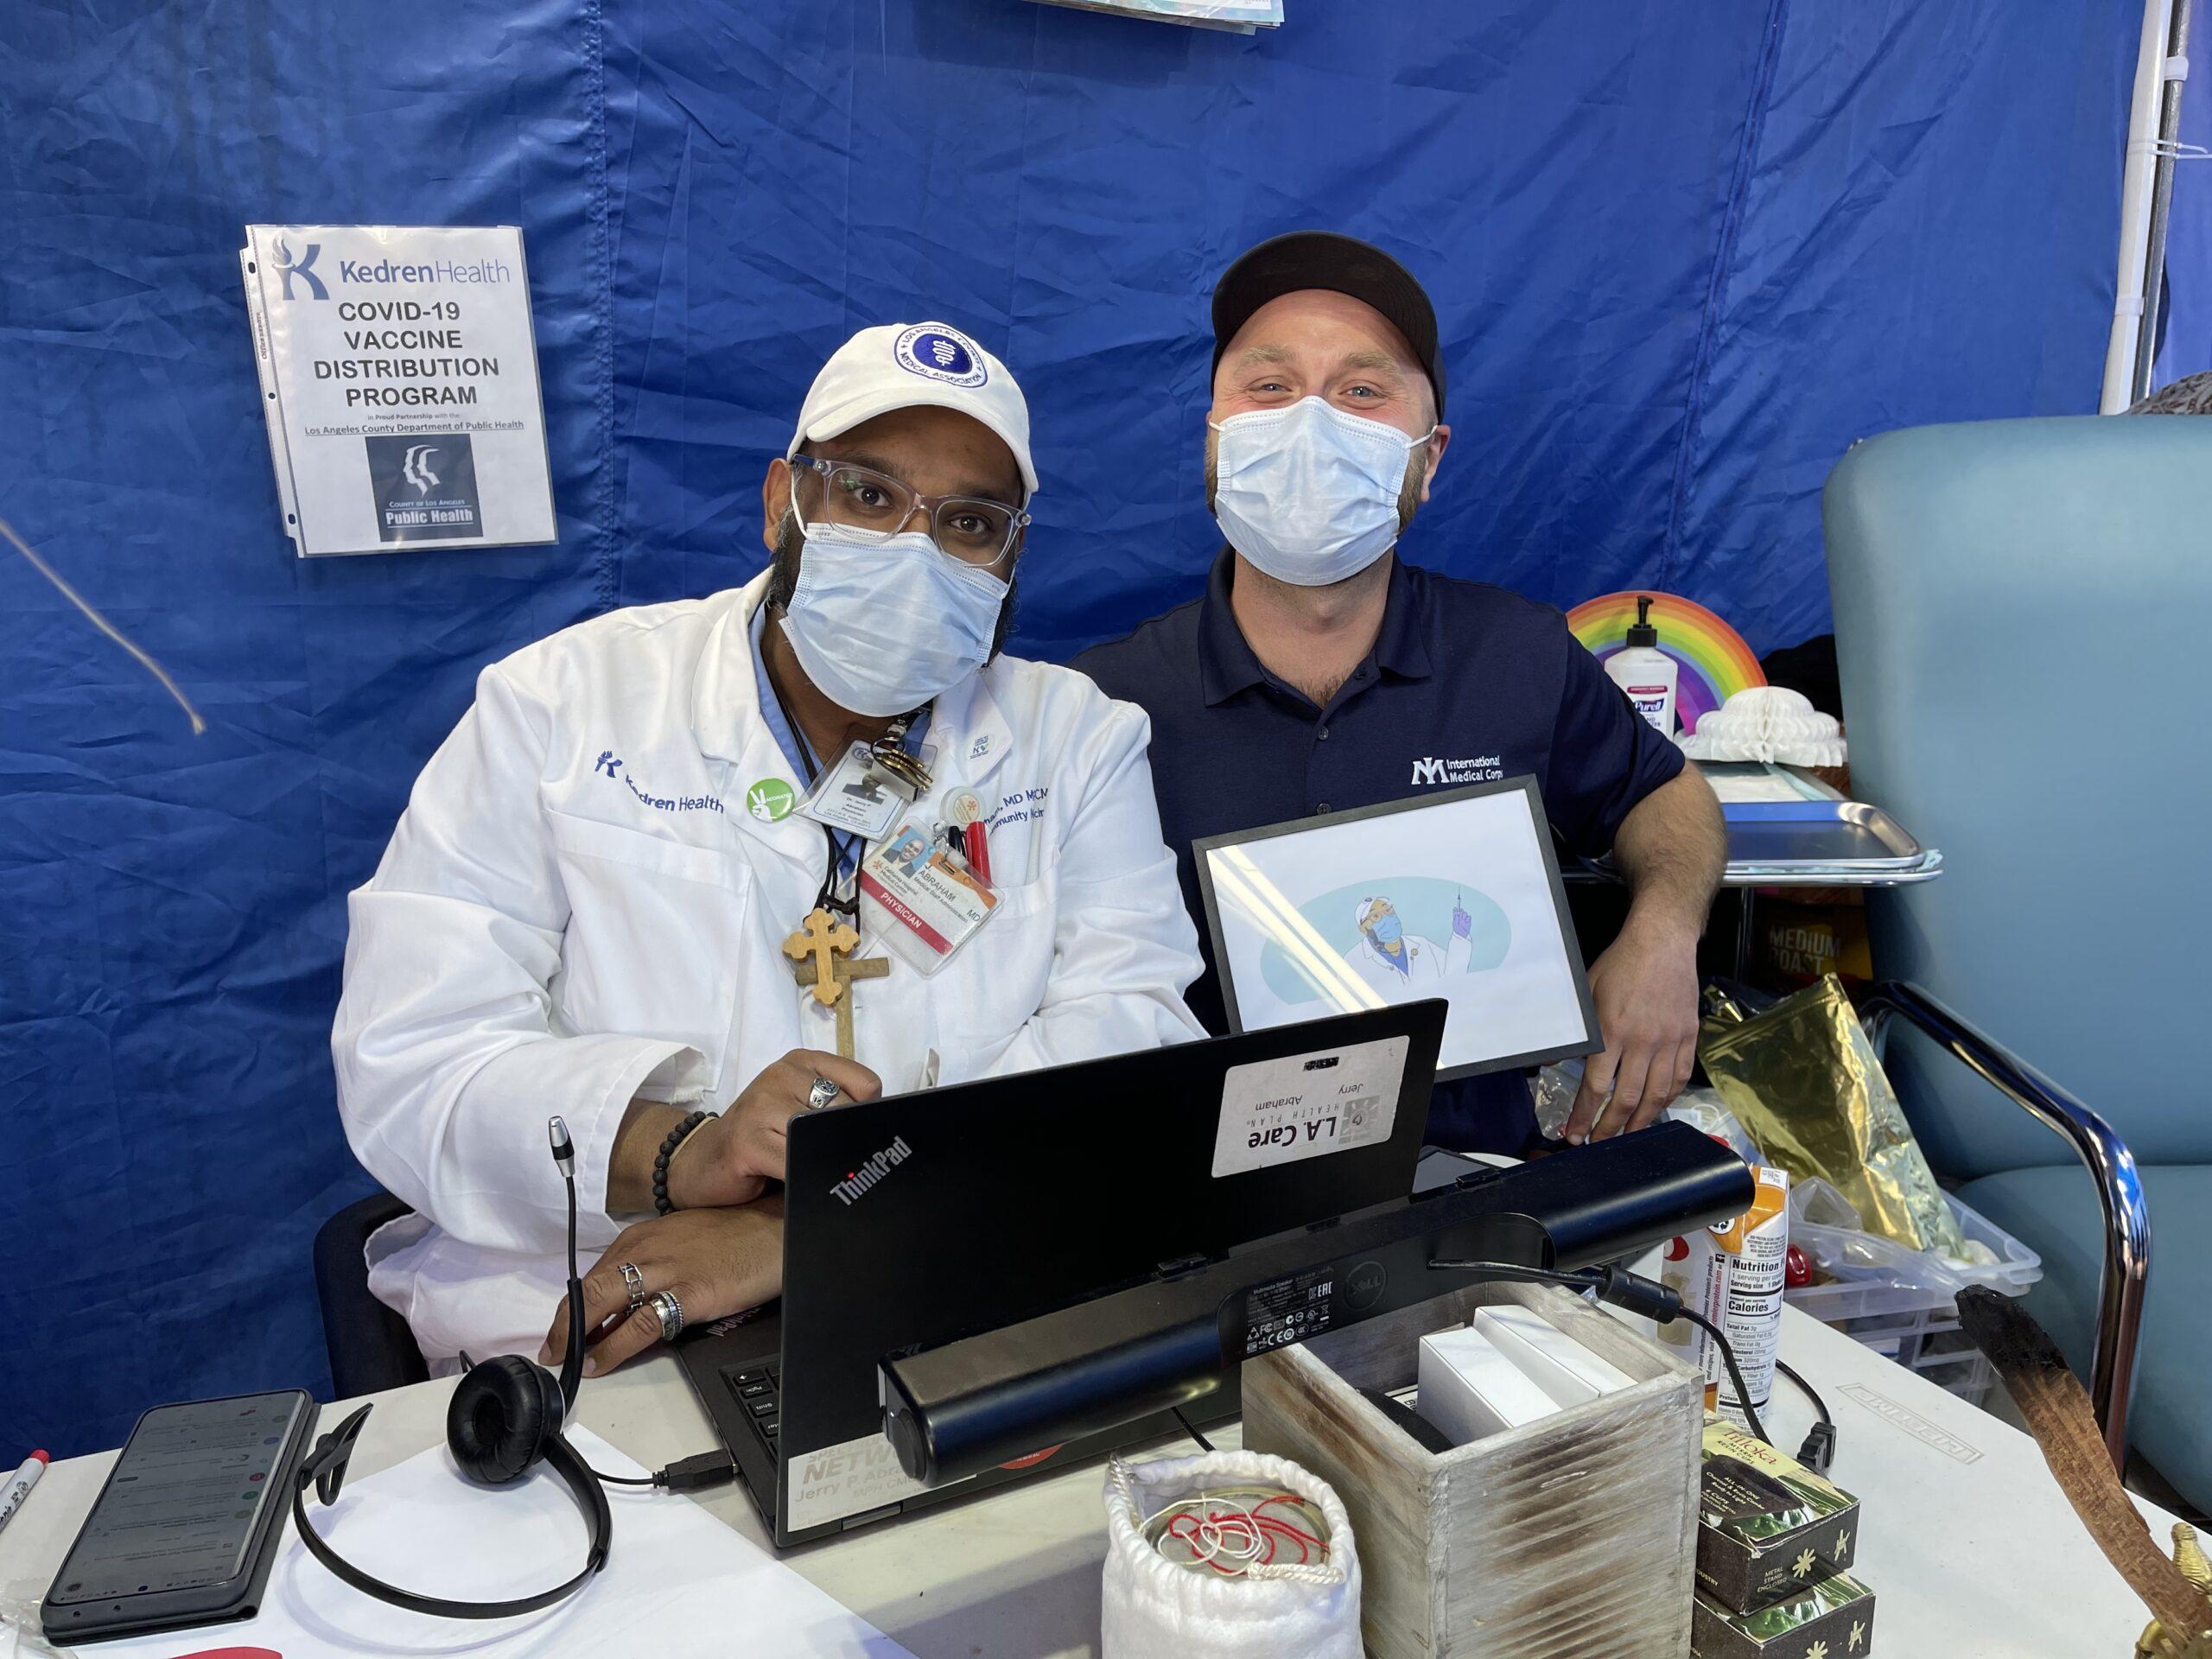 Dr. Jerry Abraham, Director of Vaccines at Kedren, and International Medical Corps ERU Officer Jonah Sargent